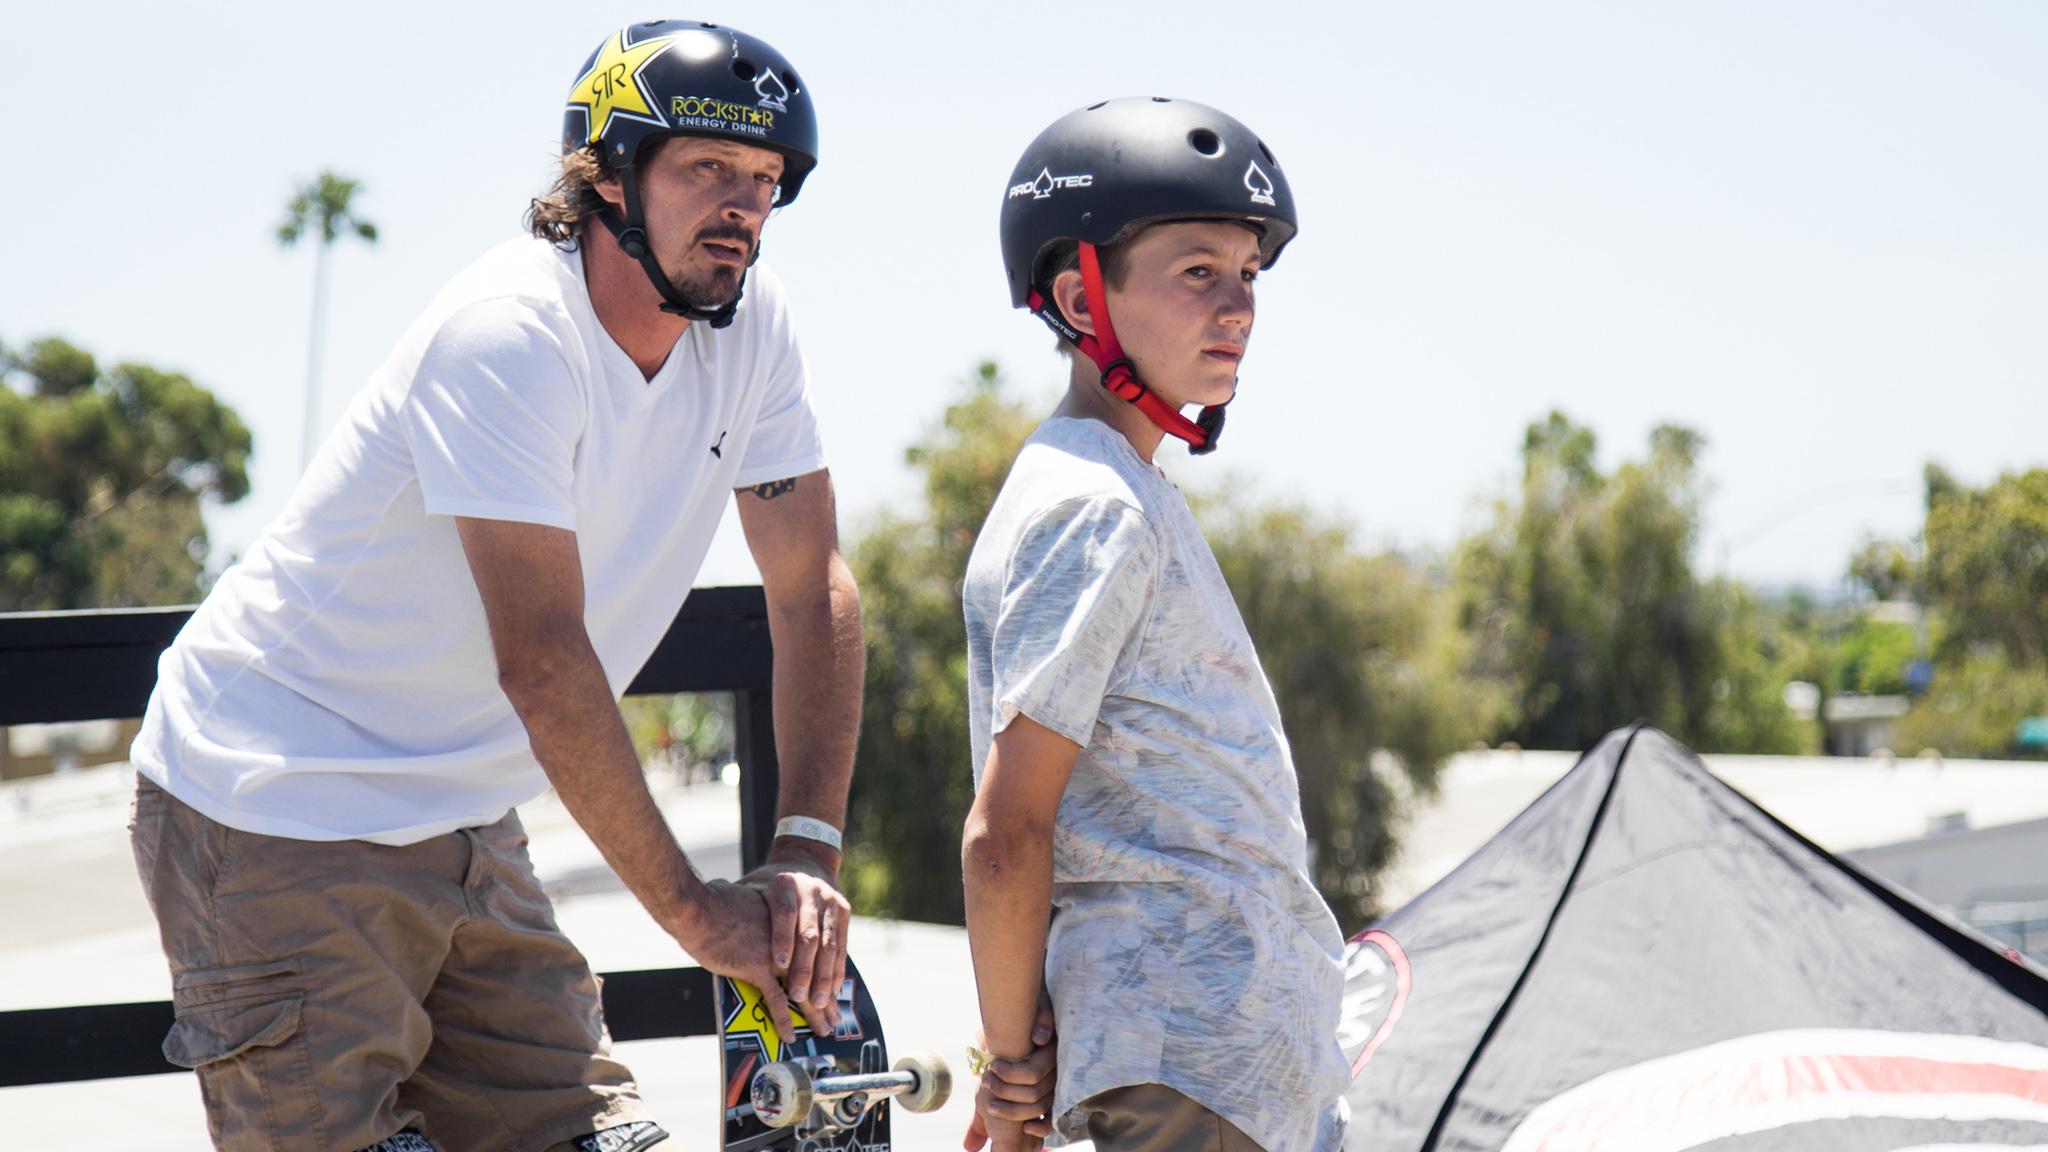 Skate generations